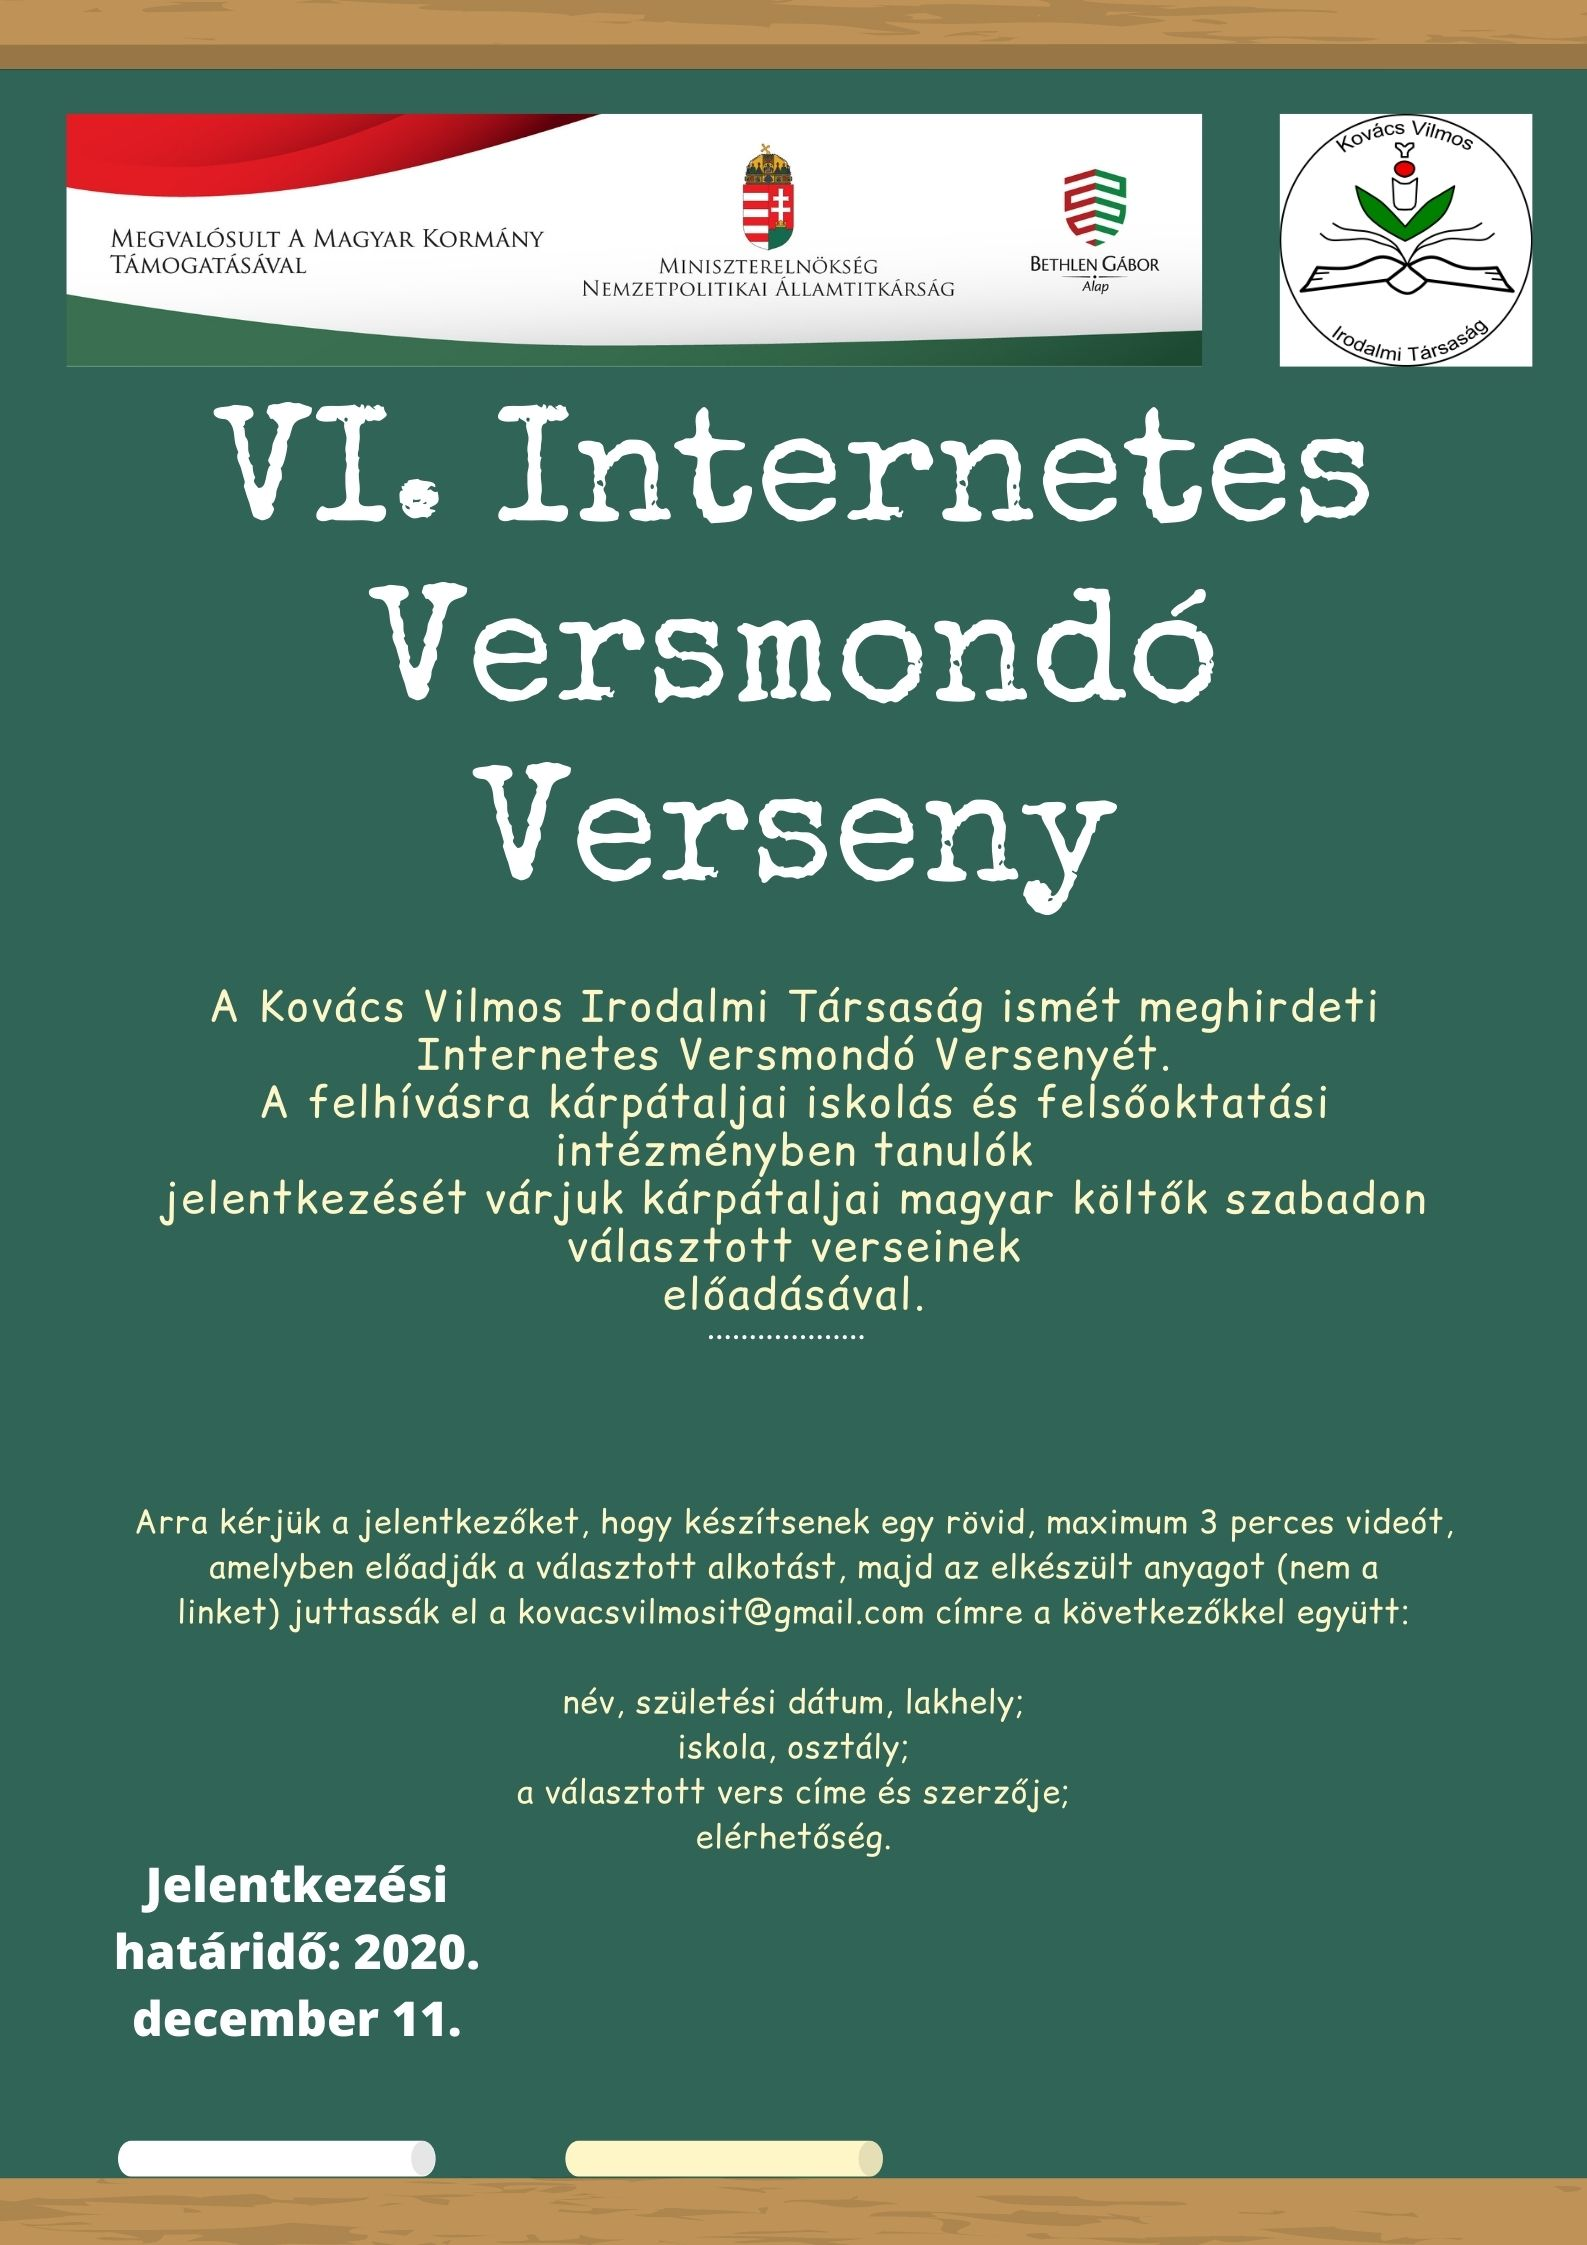 VI. Internetes Versmondó Verseny